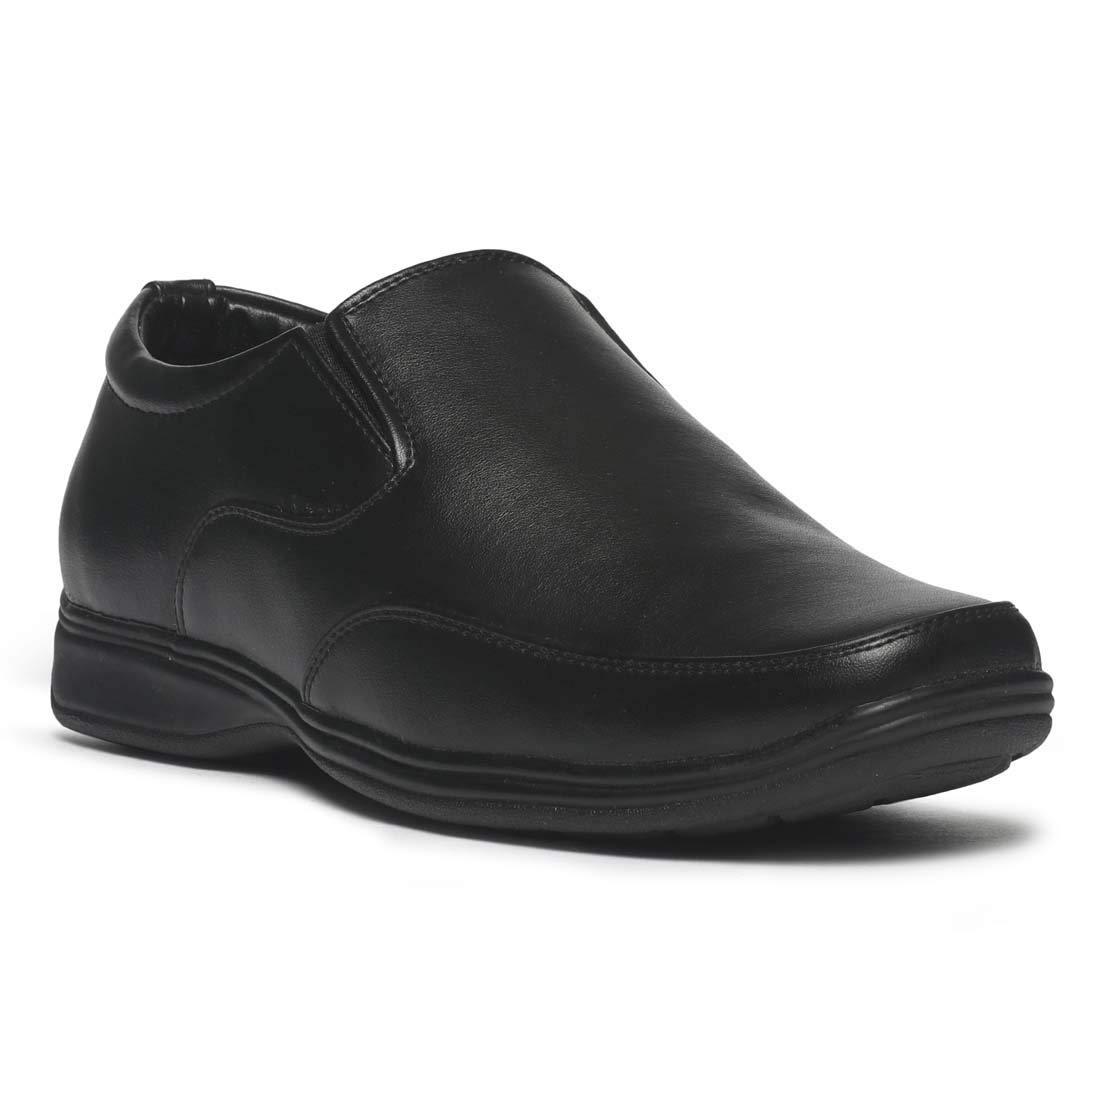 Buy PARAGON Men's Black Formal Shoes-6